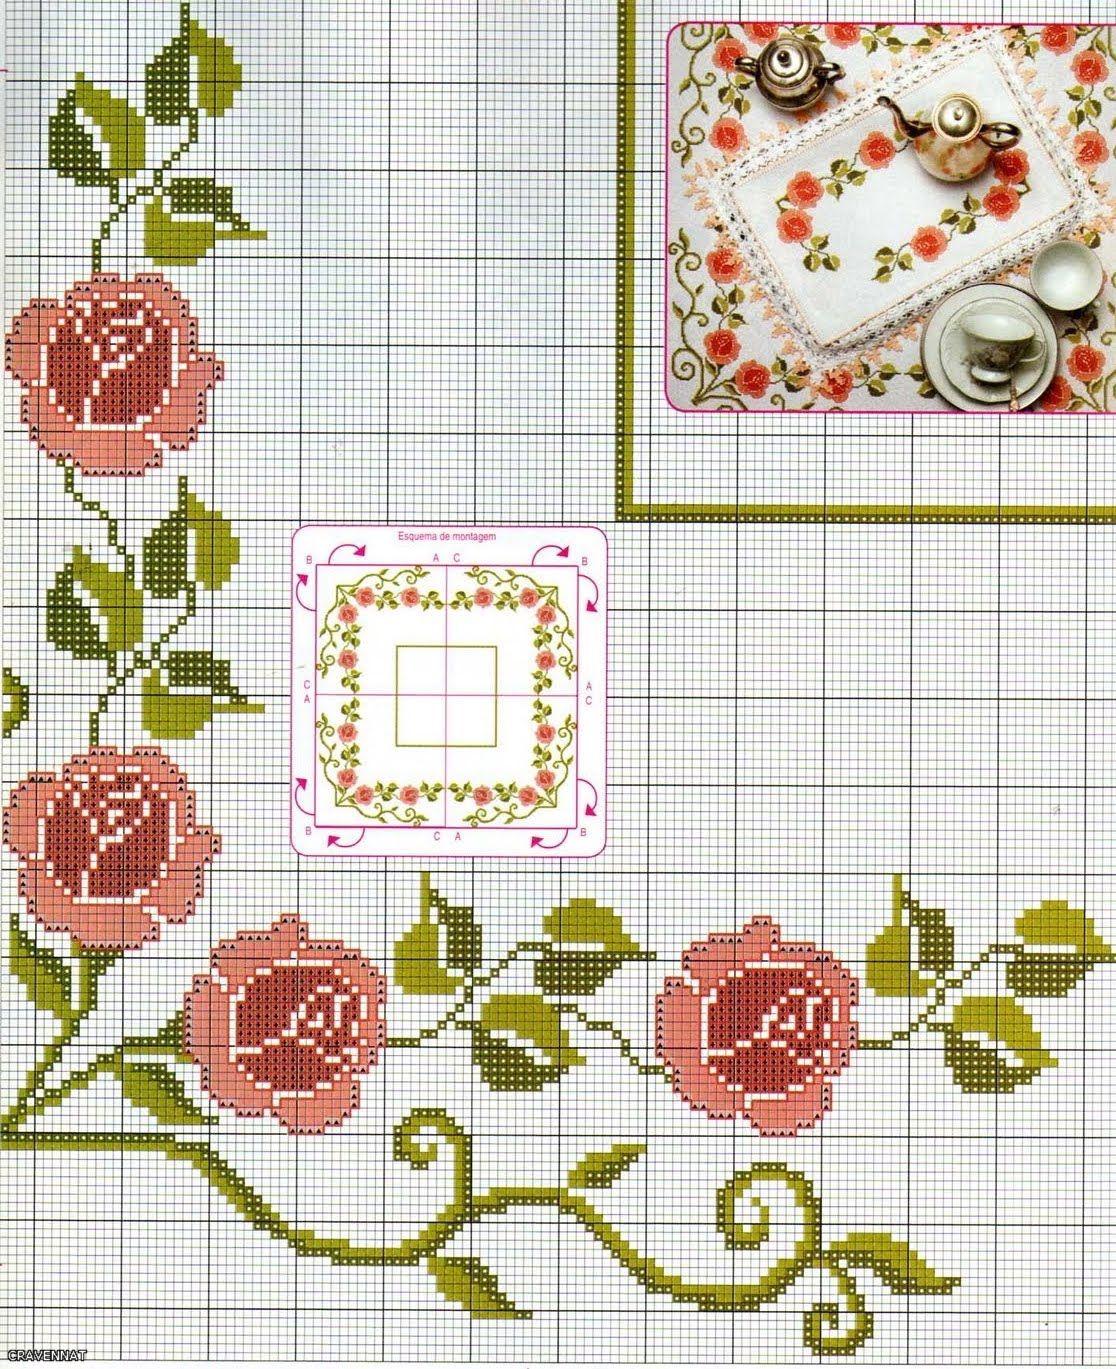 Bonitos manteles en punto de cruz cross stitch rose - Manteles de punto de cruz ...